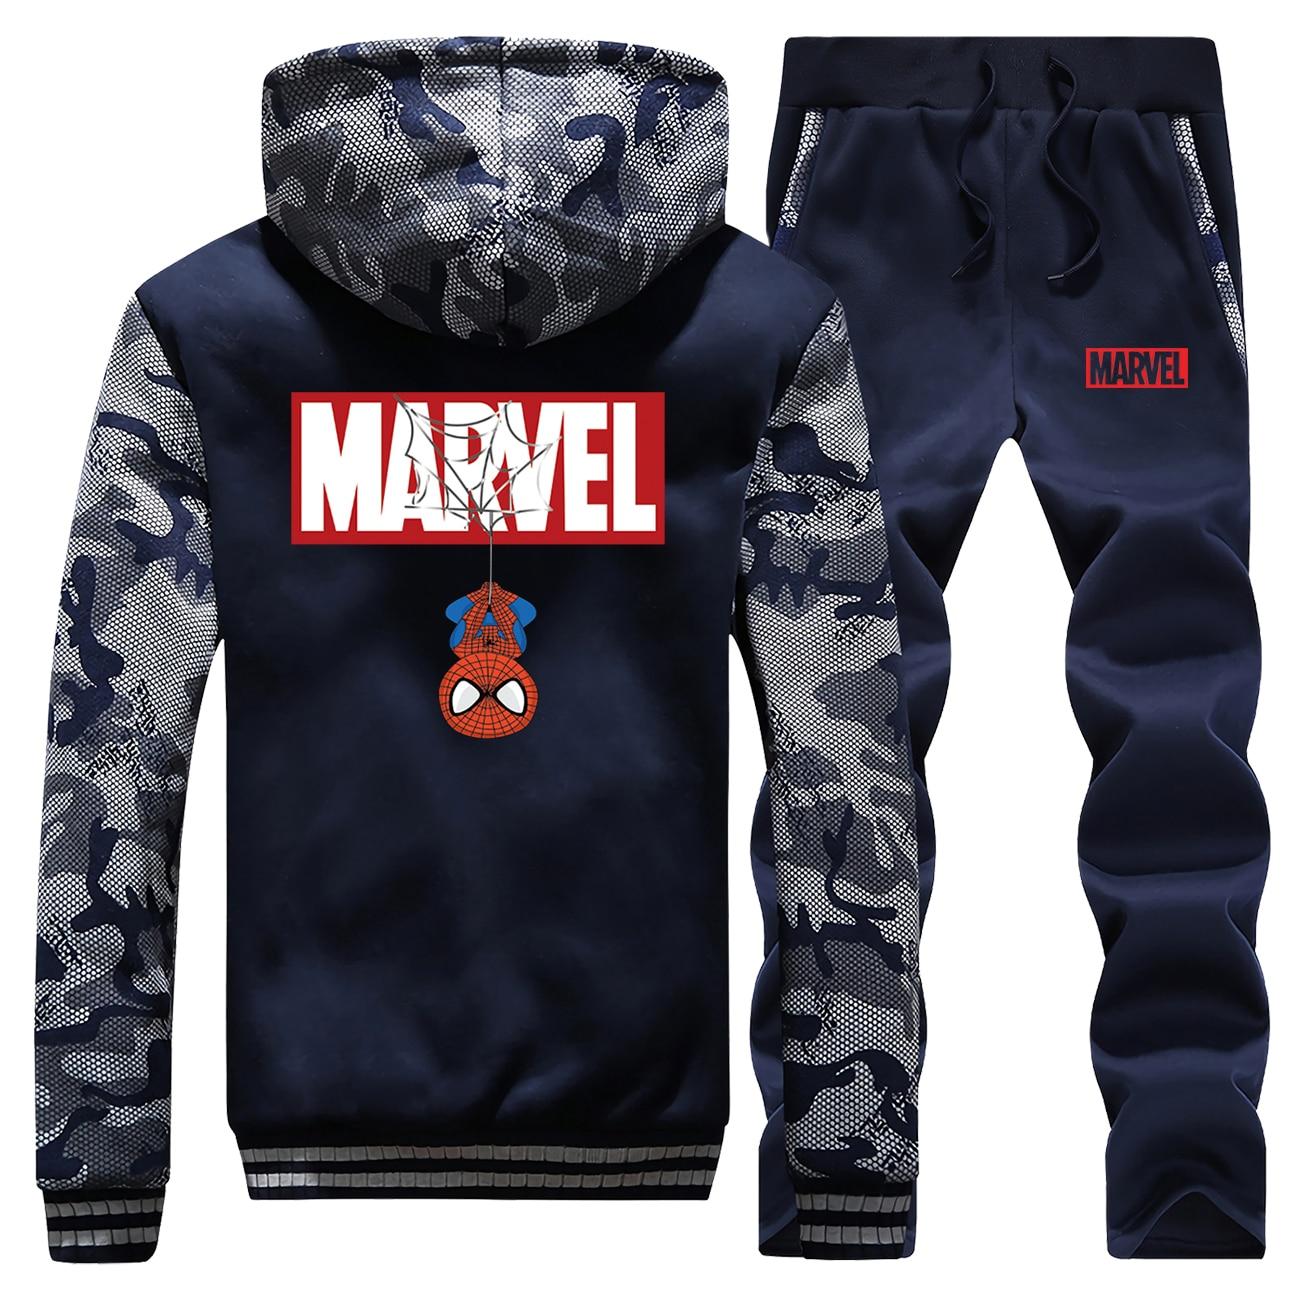 Fashion MARVEL LOGO Print Camo Hoodies Pants Sets Men Casual Spider-Man Fleece Sweatshirt Marvel Superhero Sportswear Sweatpants